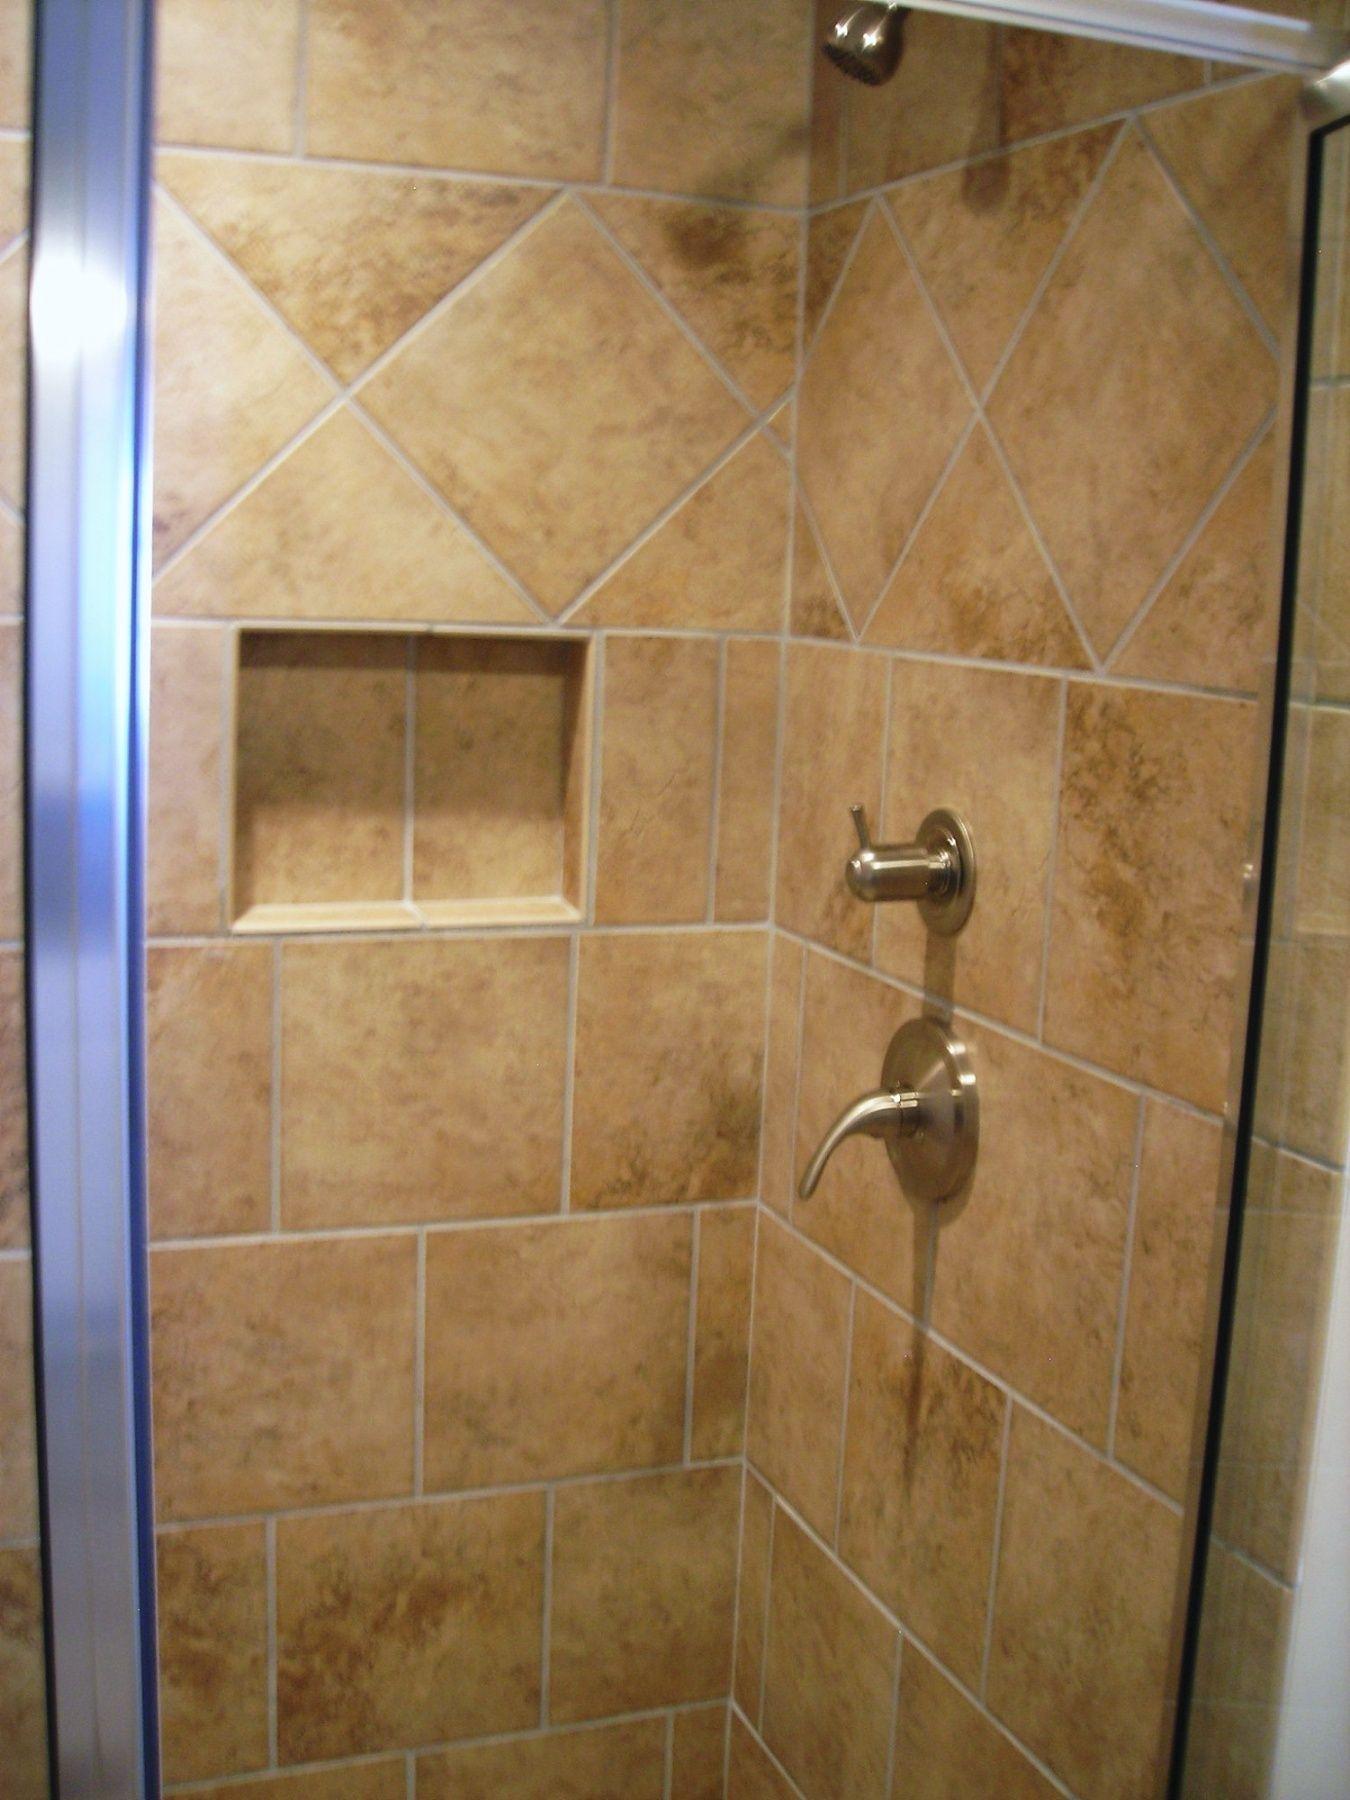 Latest Posts Under: Bathroom remodel | ideas | Pinterest | Tile ...